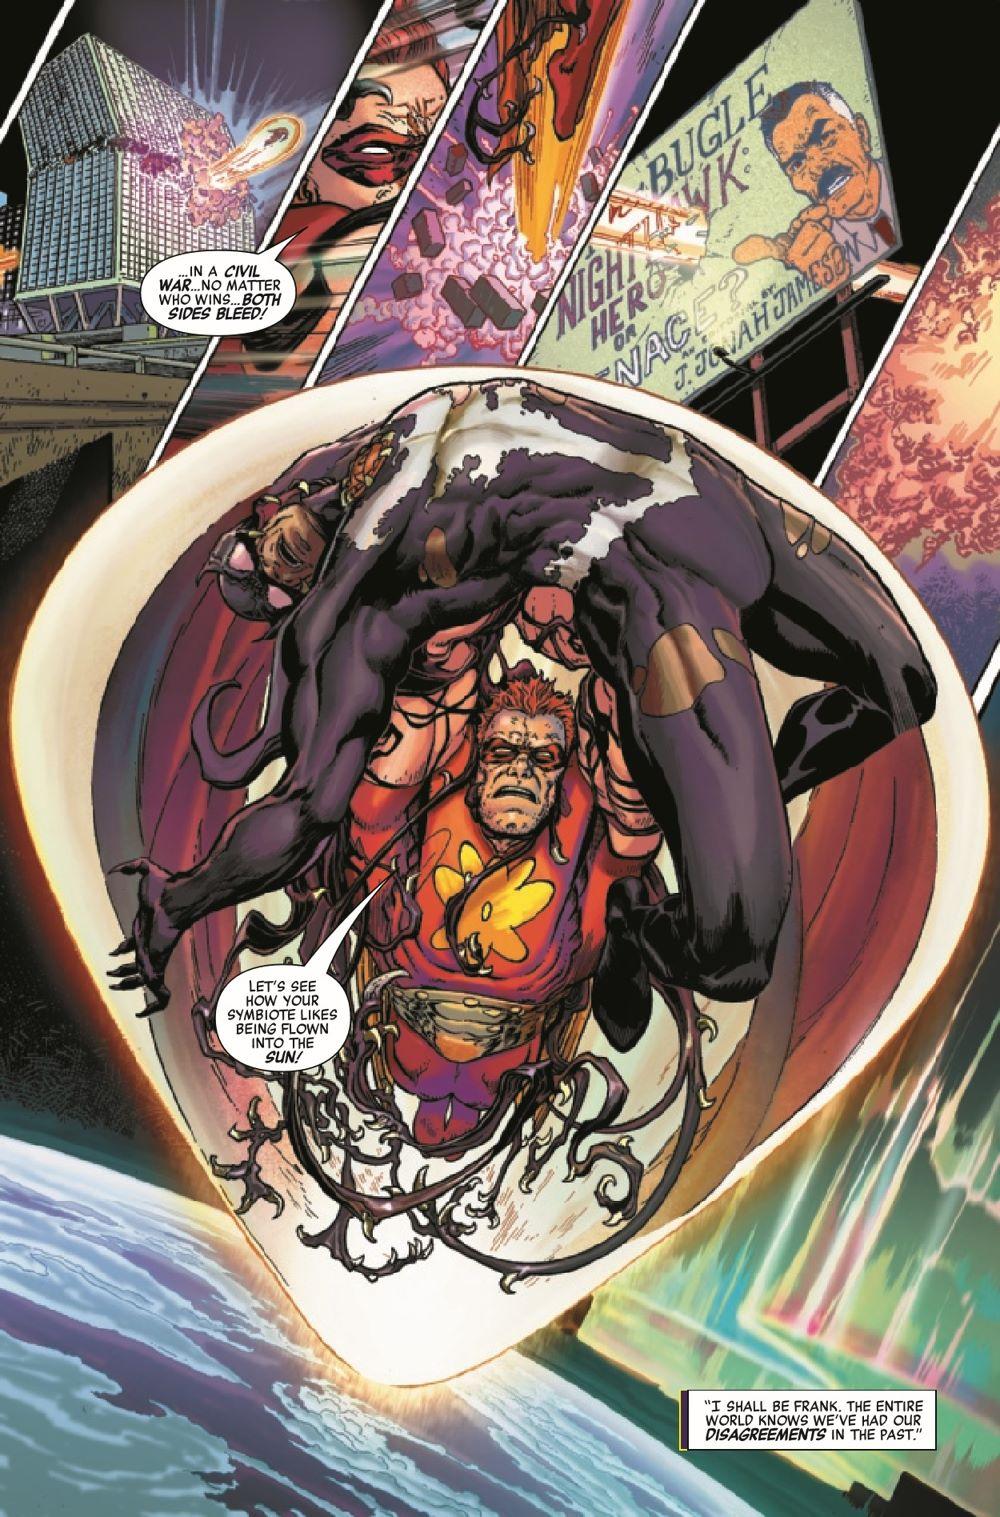 HEROESREBORN2021007_Preview-5 ComicList Previews: HEROES REBORN #7 (OF 7)